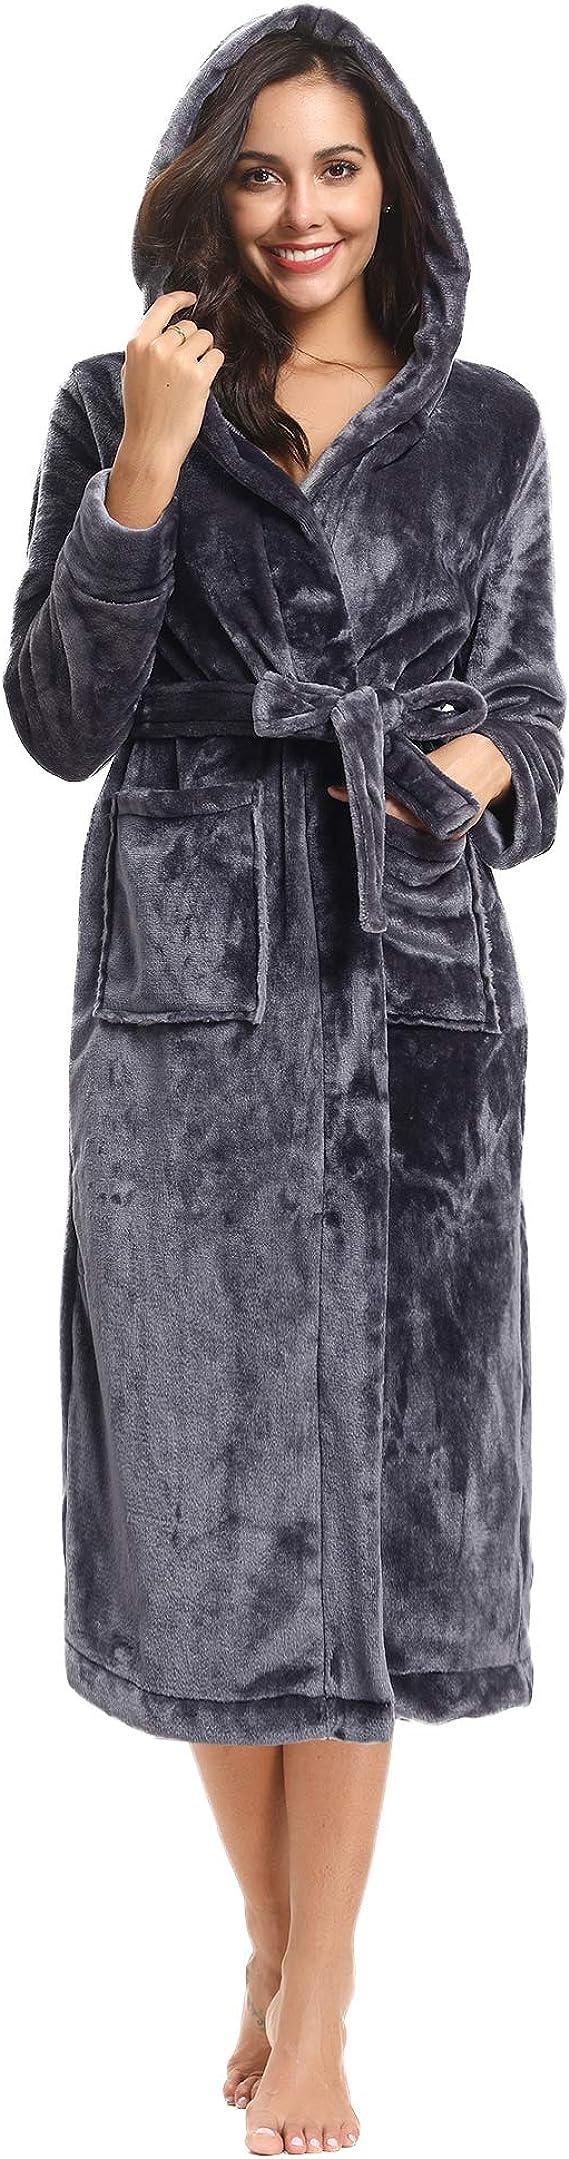 Hawiton Womens Long Robe Winter Hooded Bathrobe Loungewear Nightgown with Pockets